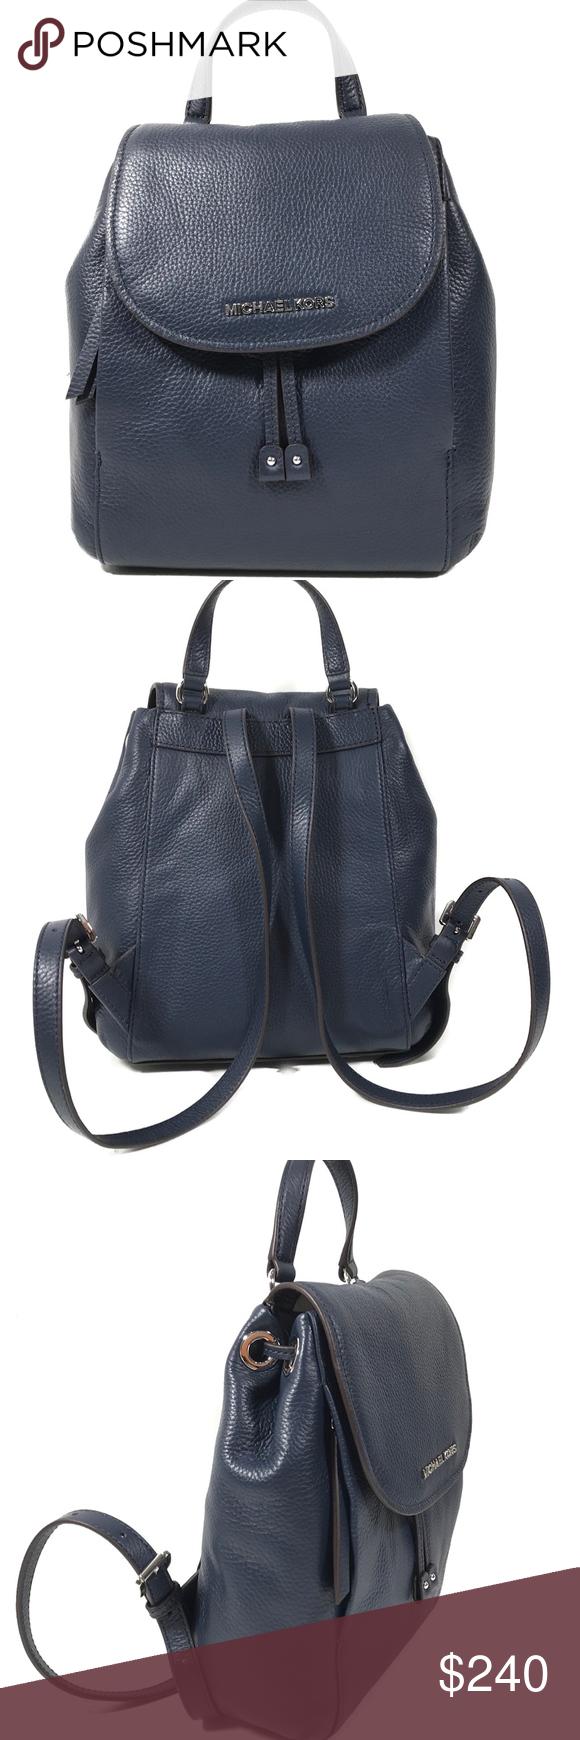 362e18a2c4bb MICHAEL KORS HAYES Medium Leather Backpack MICHAEL KORS Riley Medium Leather  Backpack Brand: Michael Kors